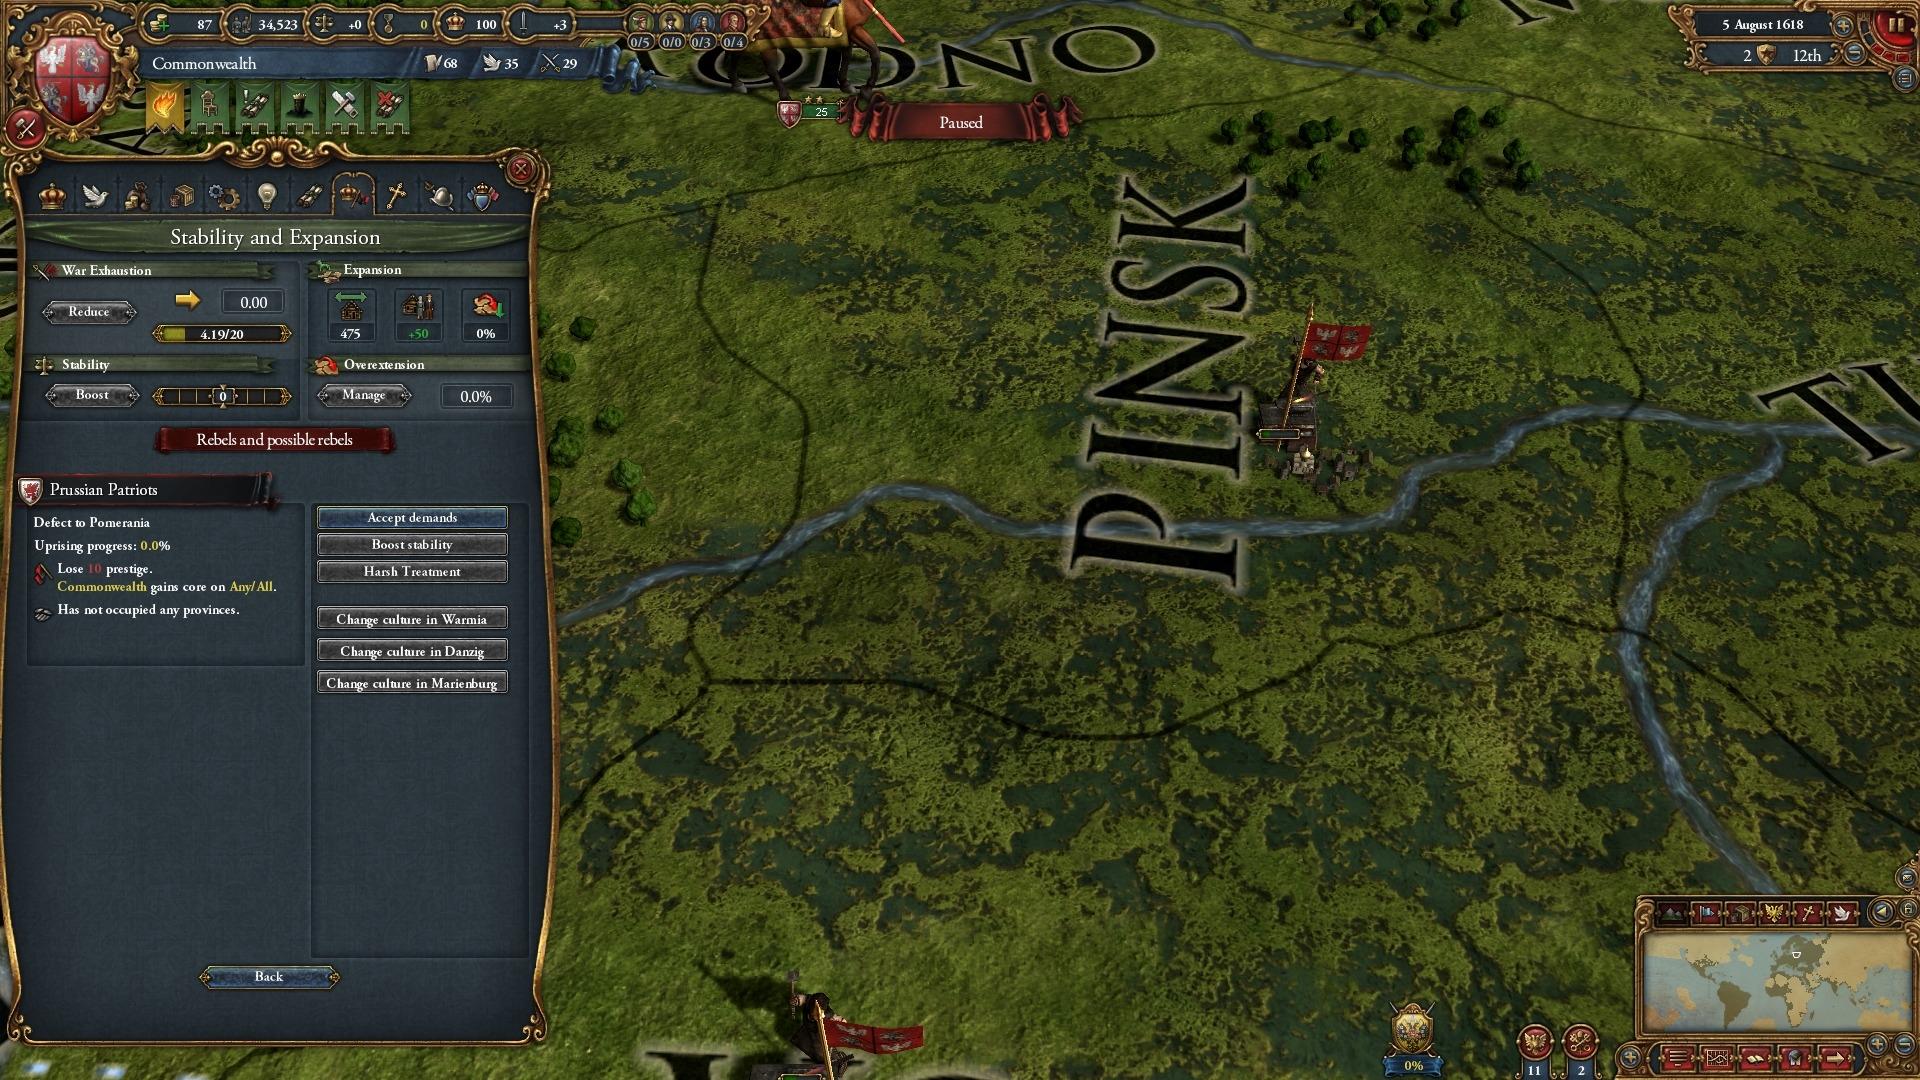 Europa Universalis IV: Art of War Expansion | ROW (dd8b88e6-0892-4ccc-af0f-4f779082c071)